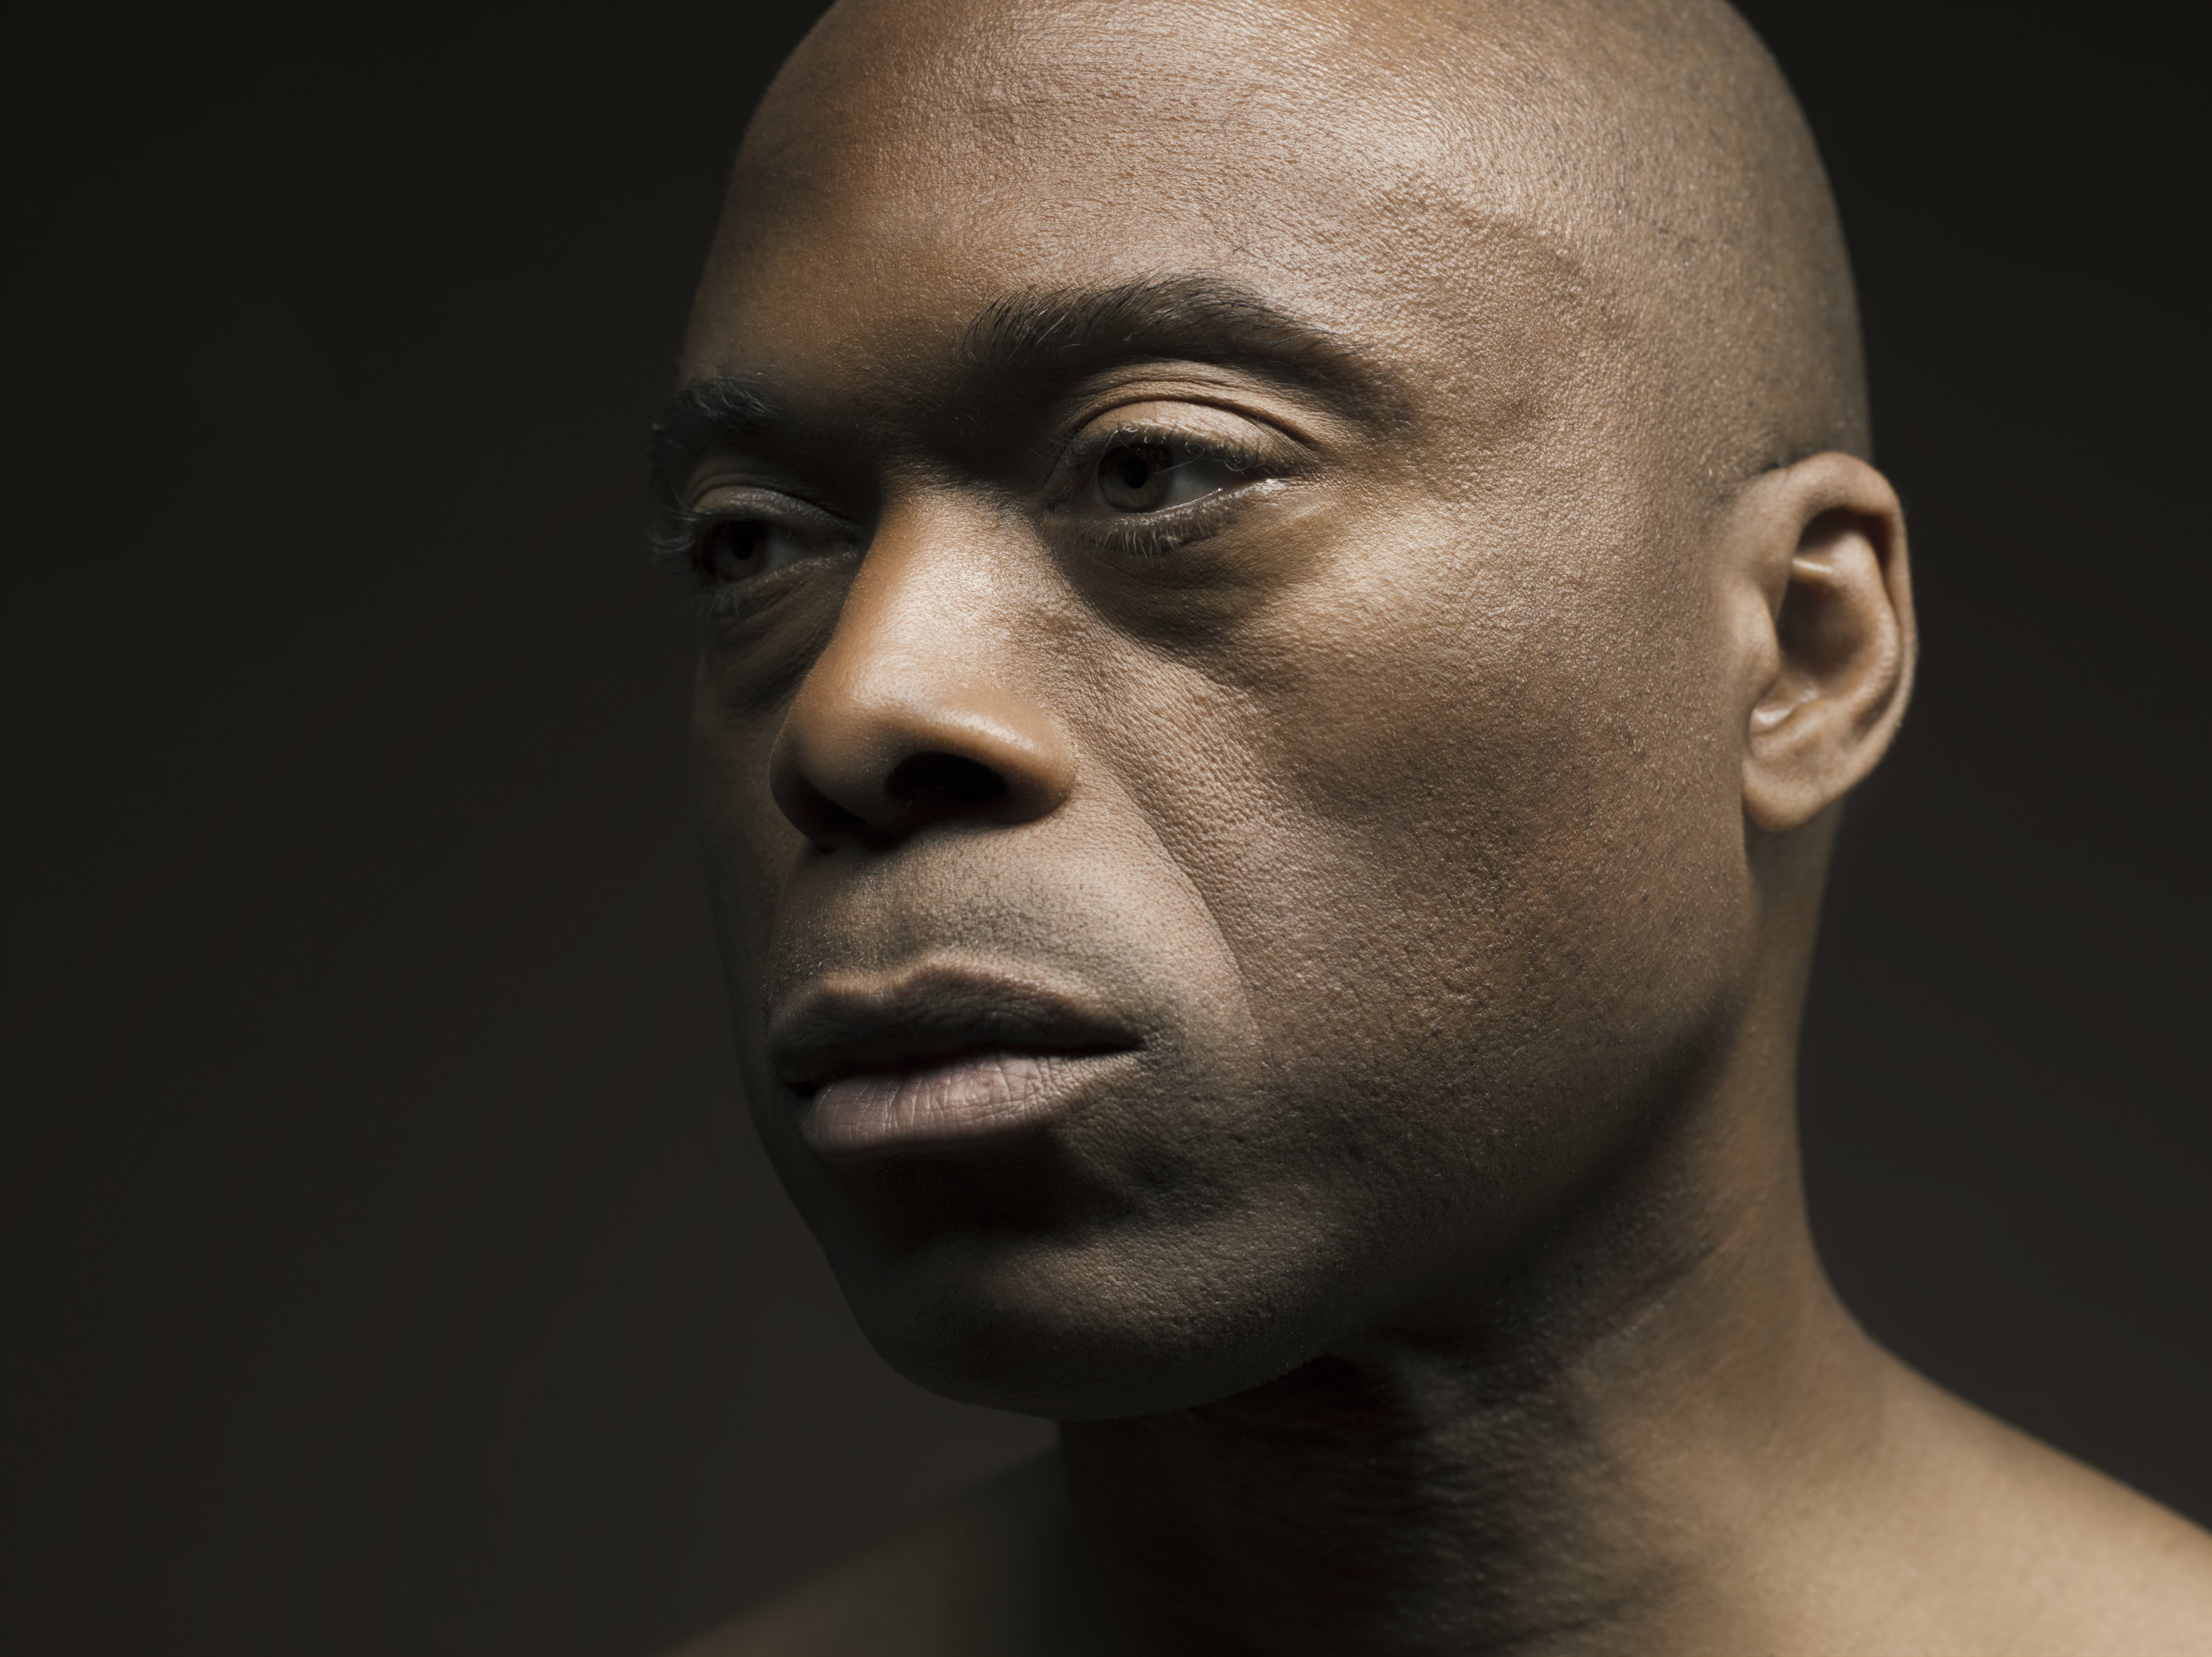 face black guy retouched.jpg